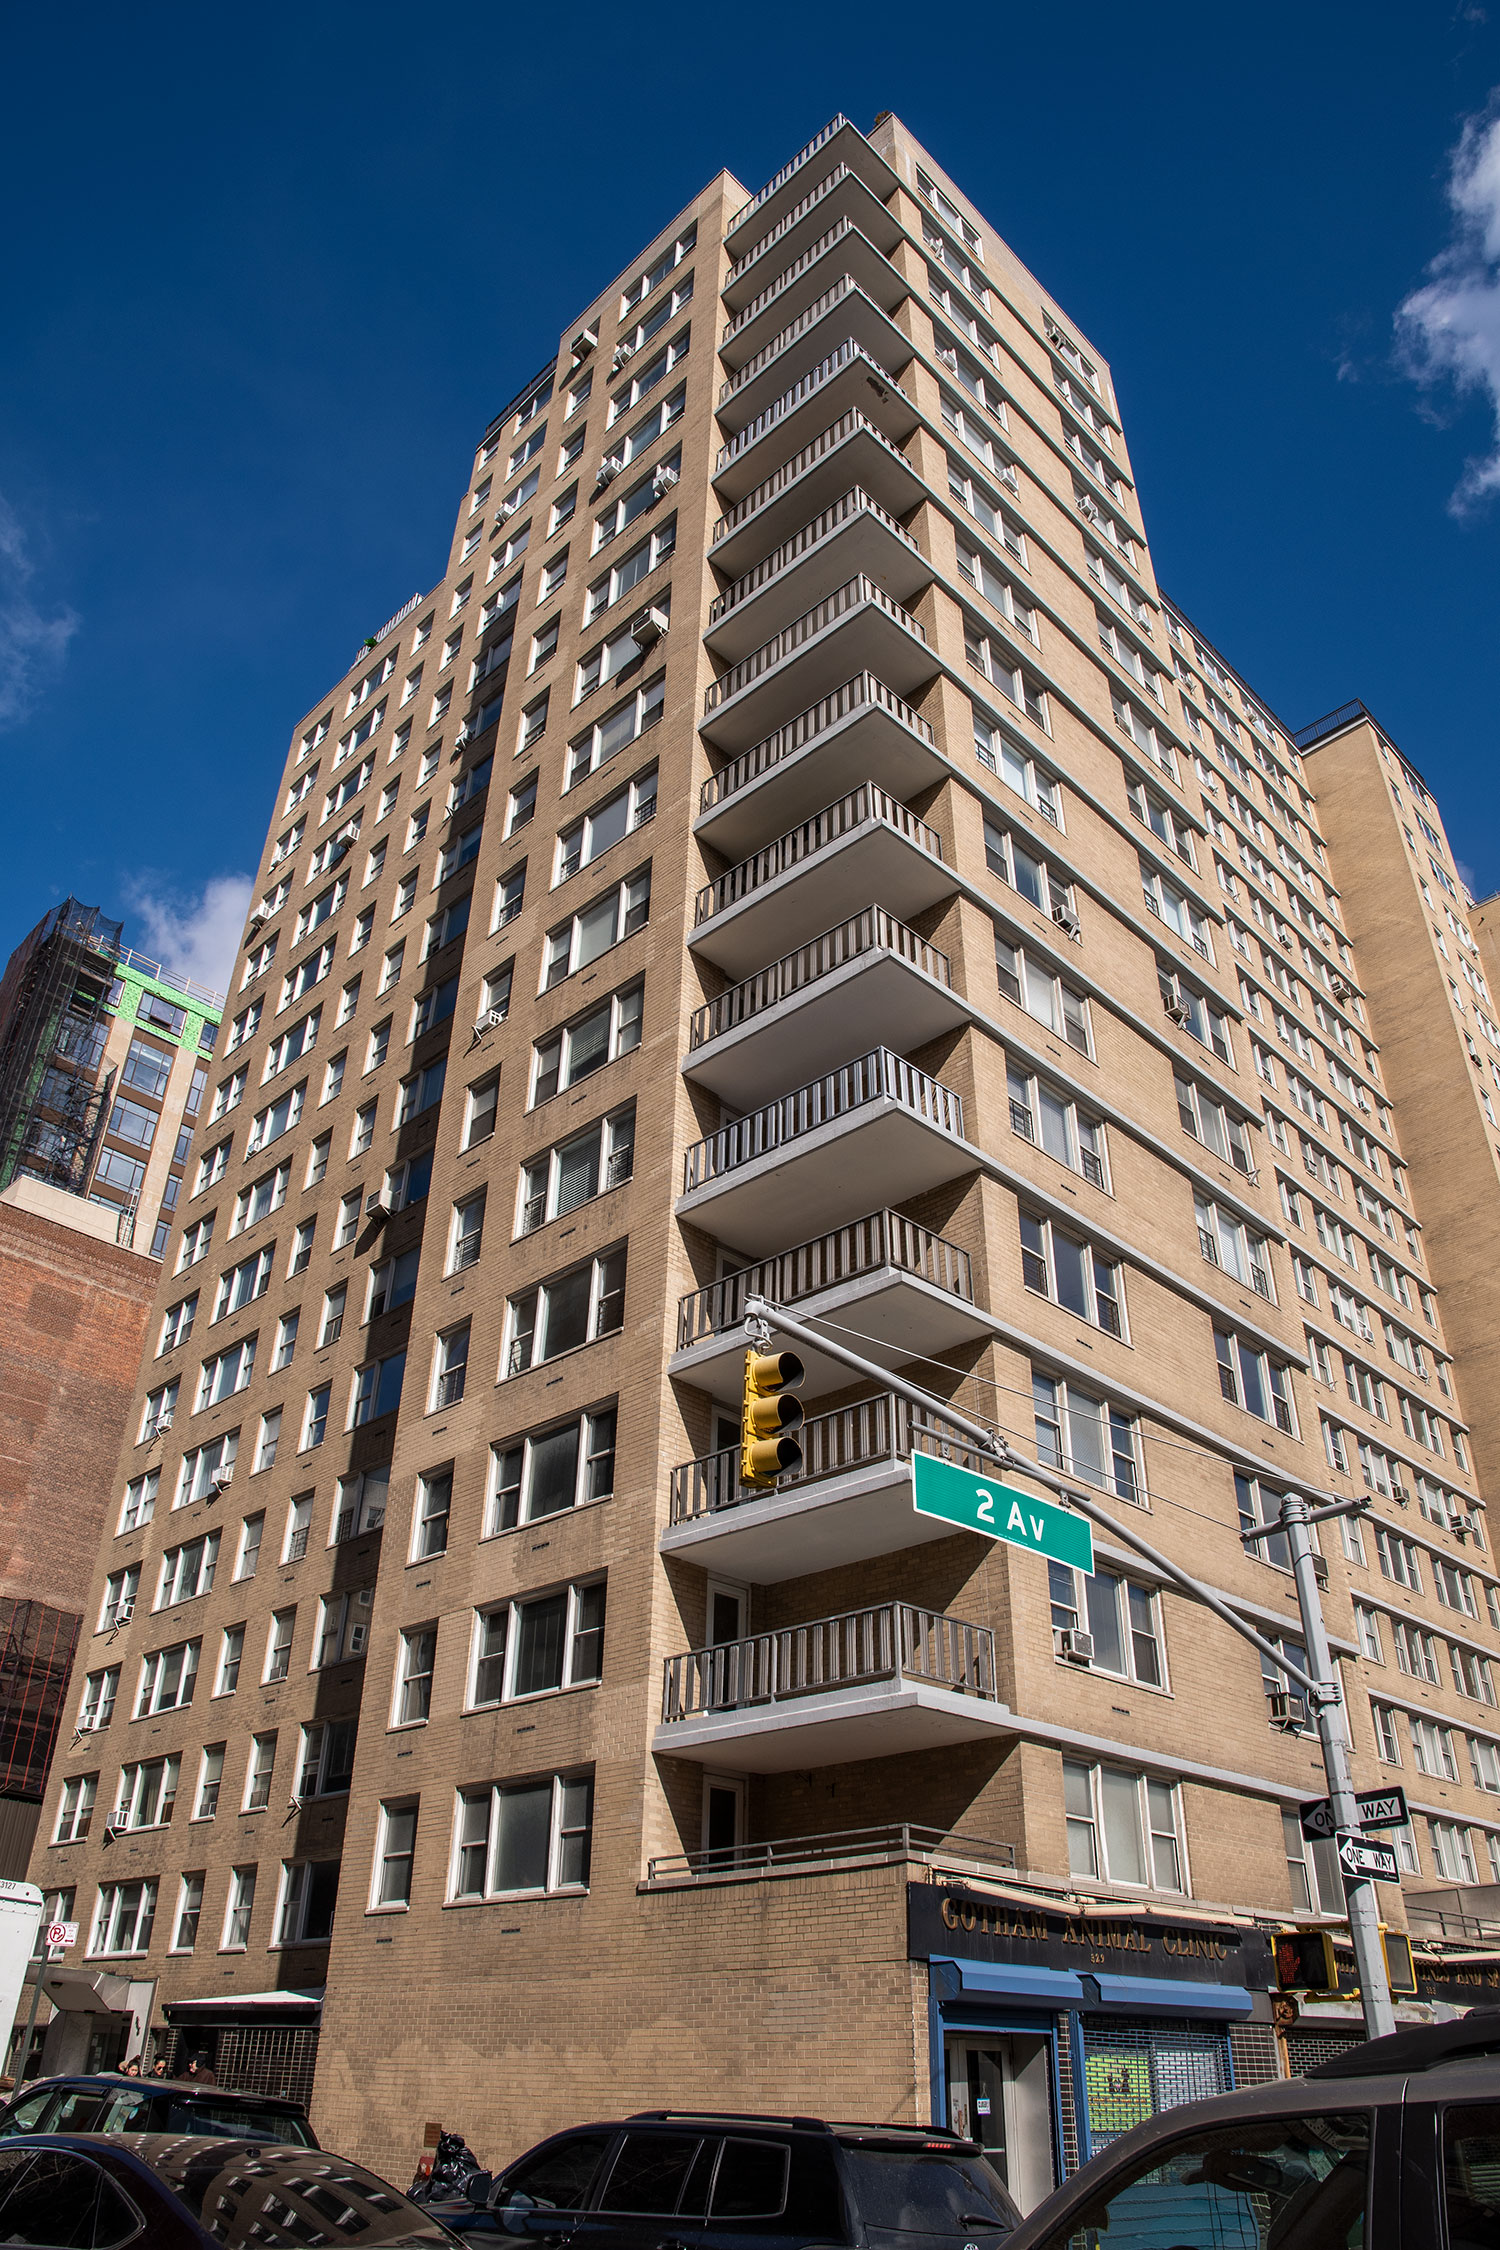 245 east 19th street -